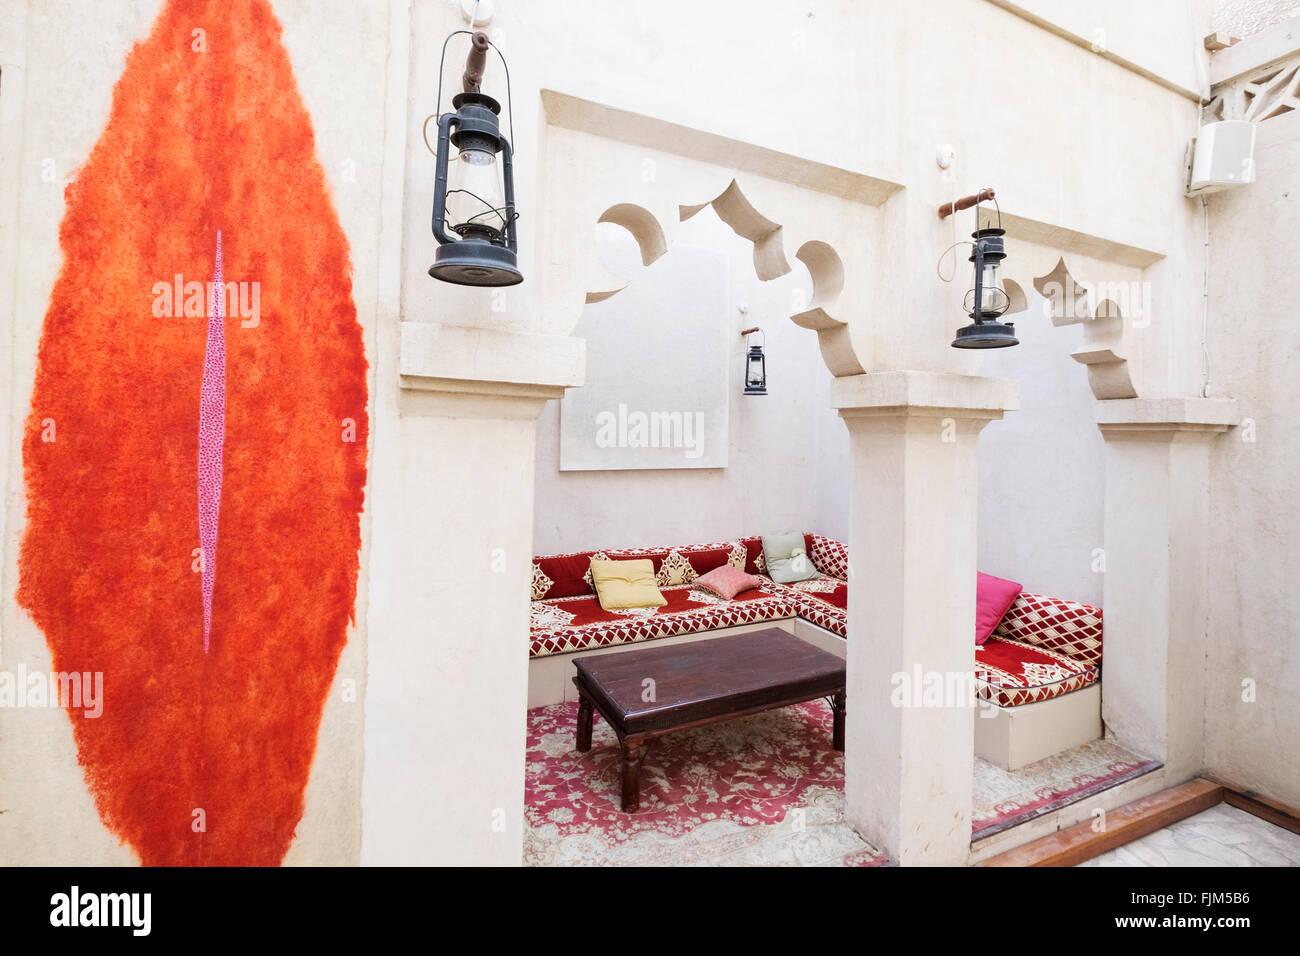 Art works on display at XVA gallery and hotel in Bastakiya old district of Dubai United Arab Emirates - Stock Image